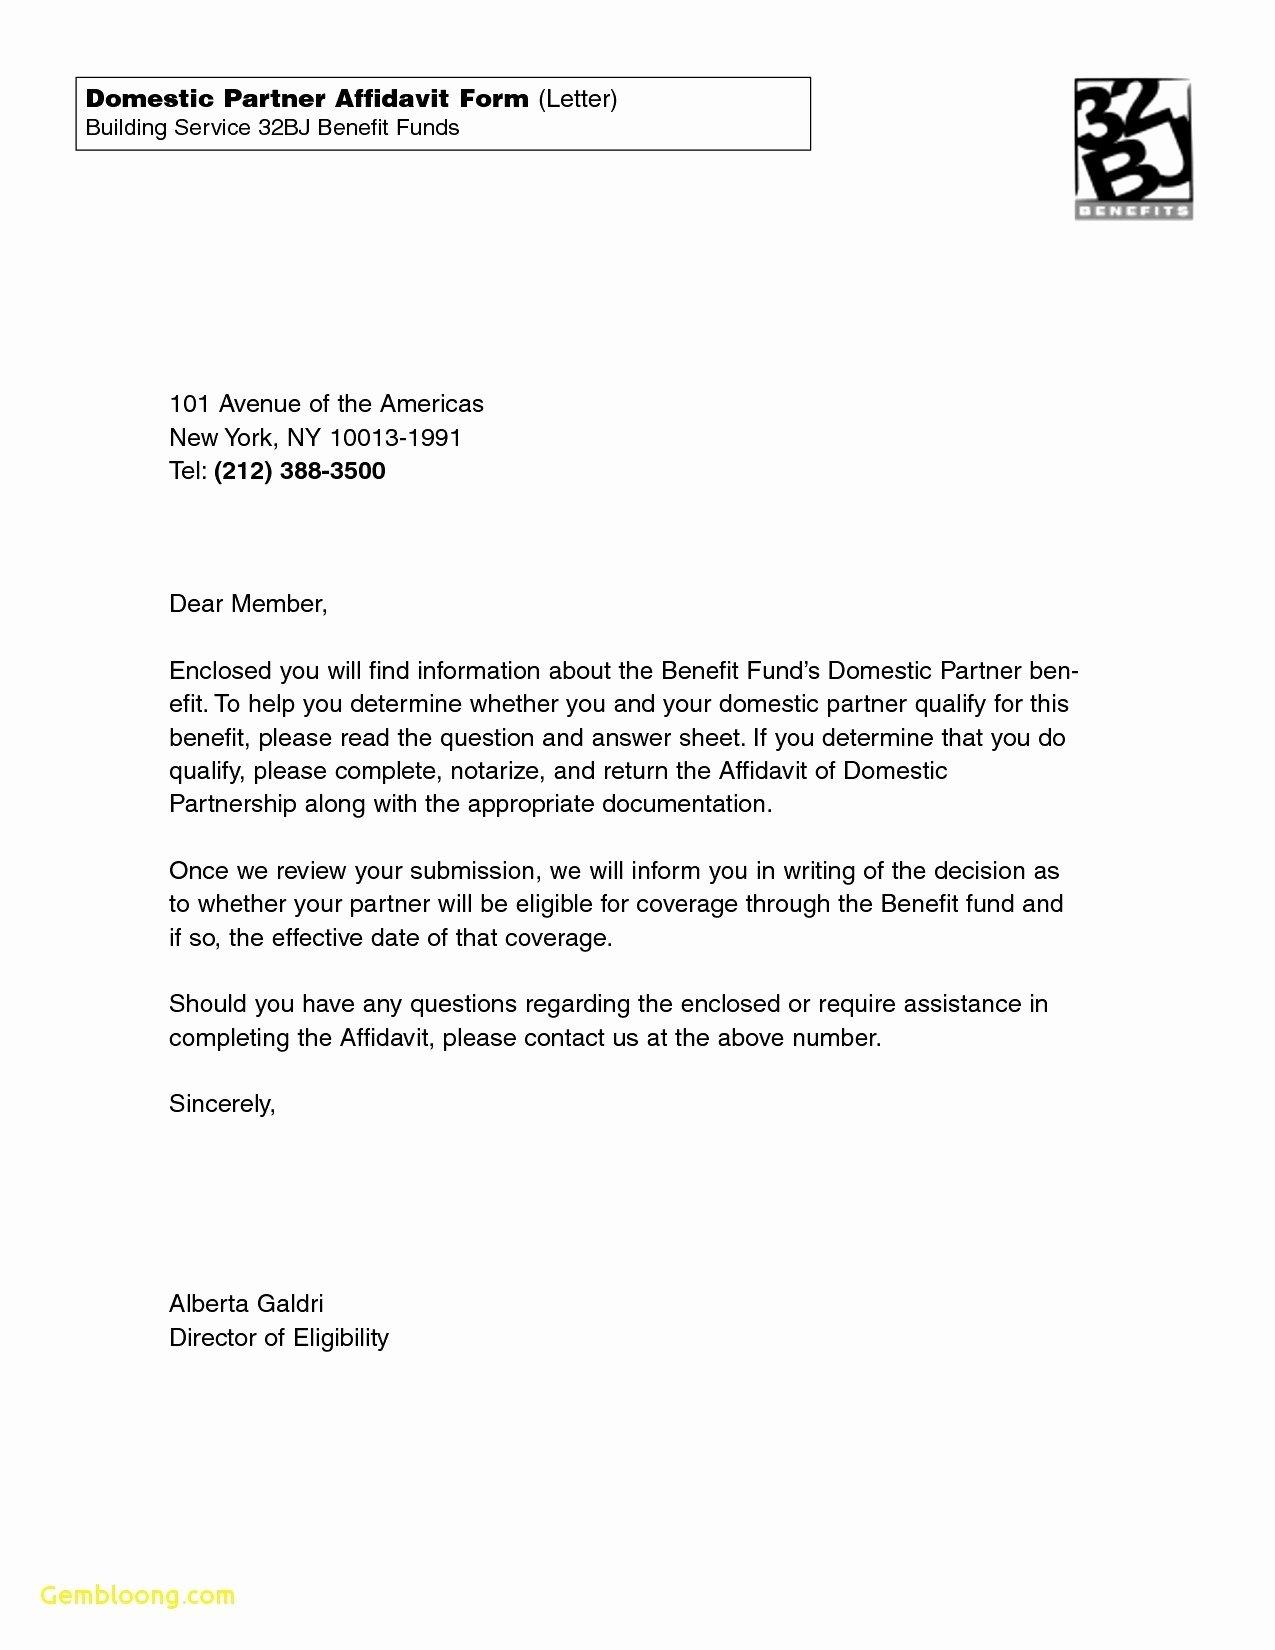 Affidavit Of Support Example Letters Fresh Affidavit Letter Template Marriage Sworn Sample Free for